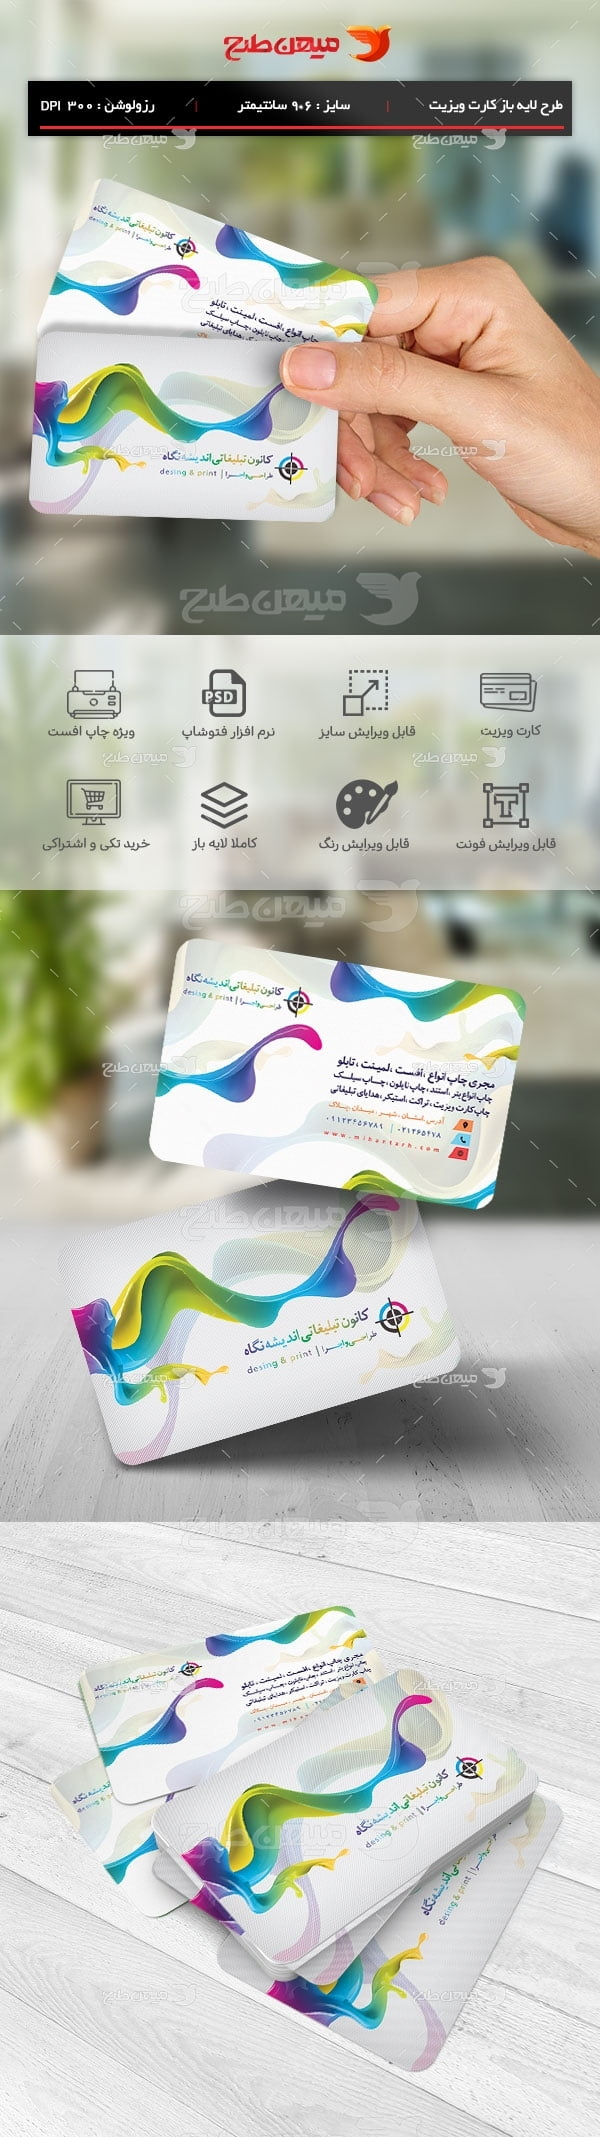 طرح لایه باز کارت ویزیت کانون تبلیغاتی